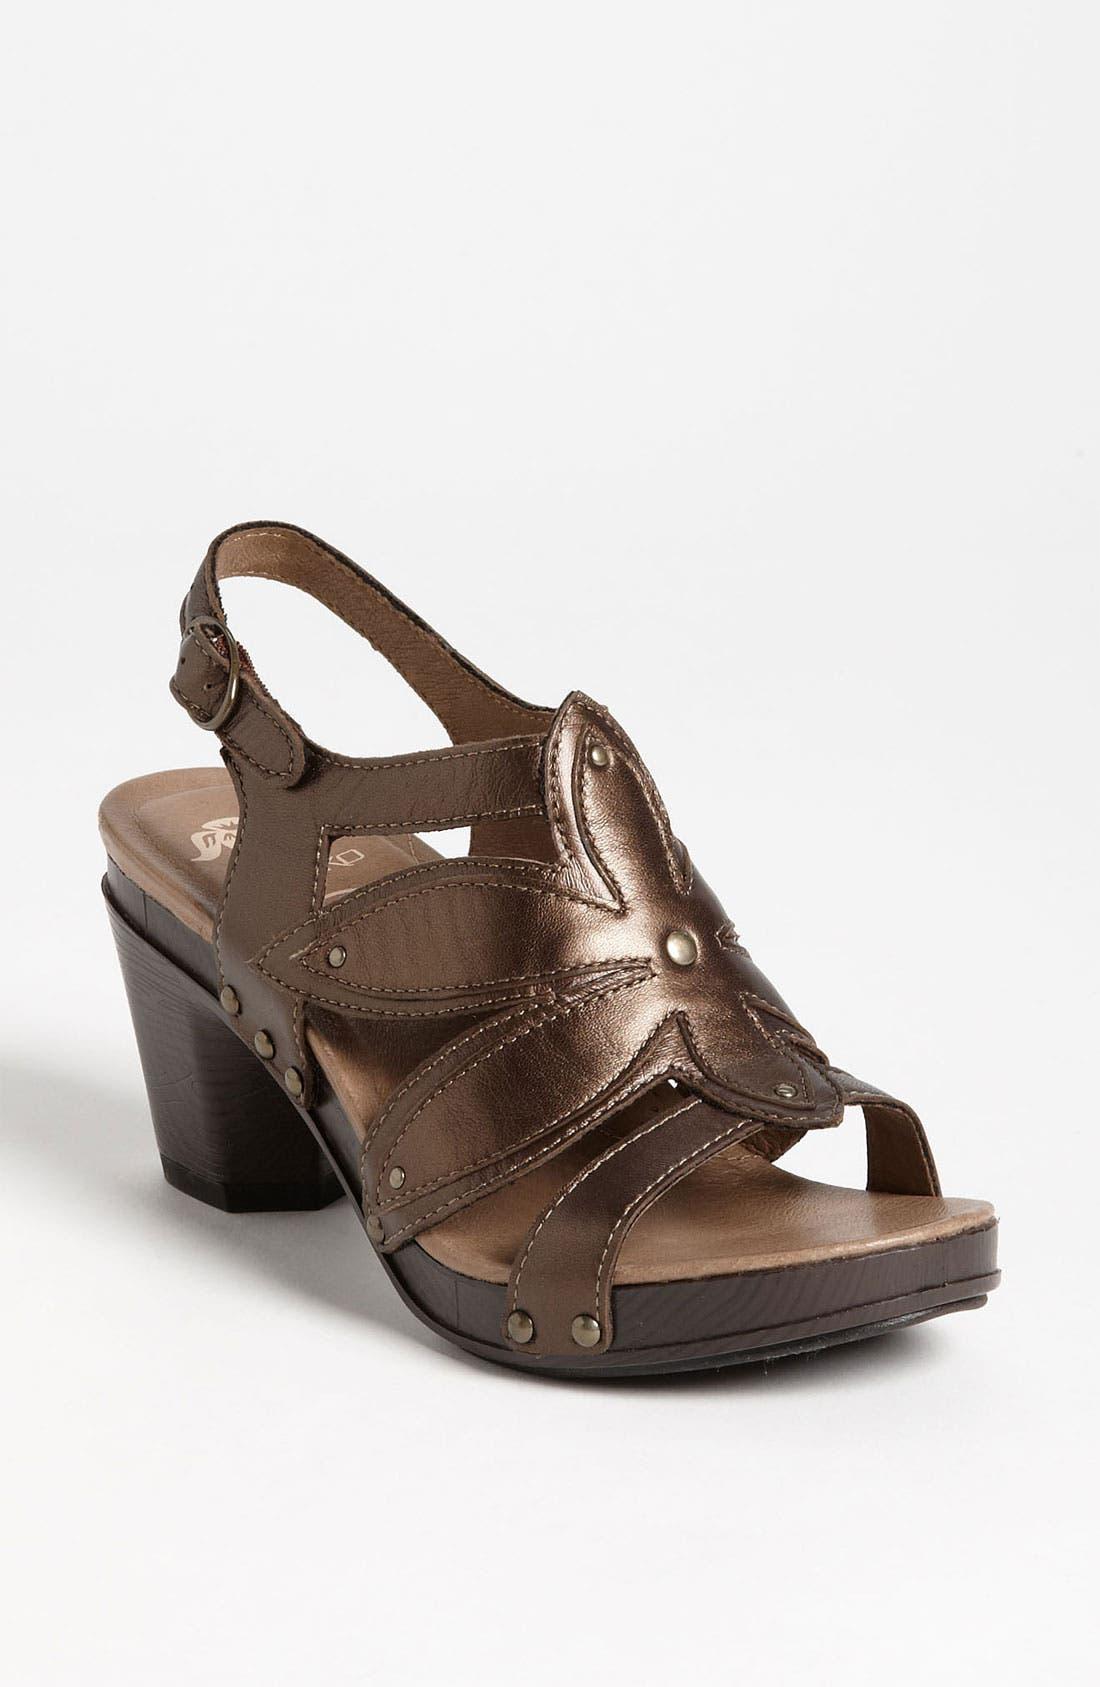 Alternate Image 1 Selected - Dansko 'Nina' Sandal